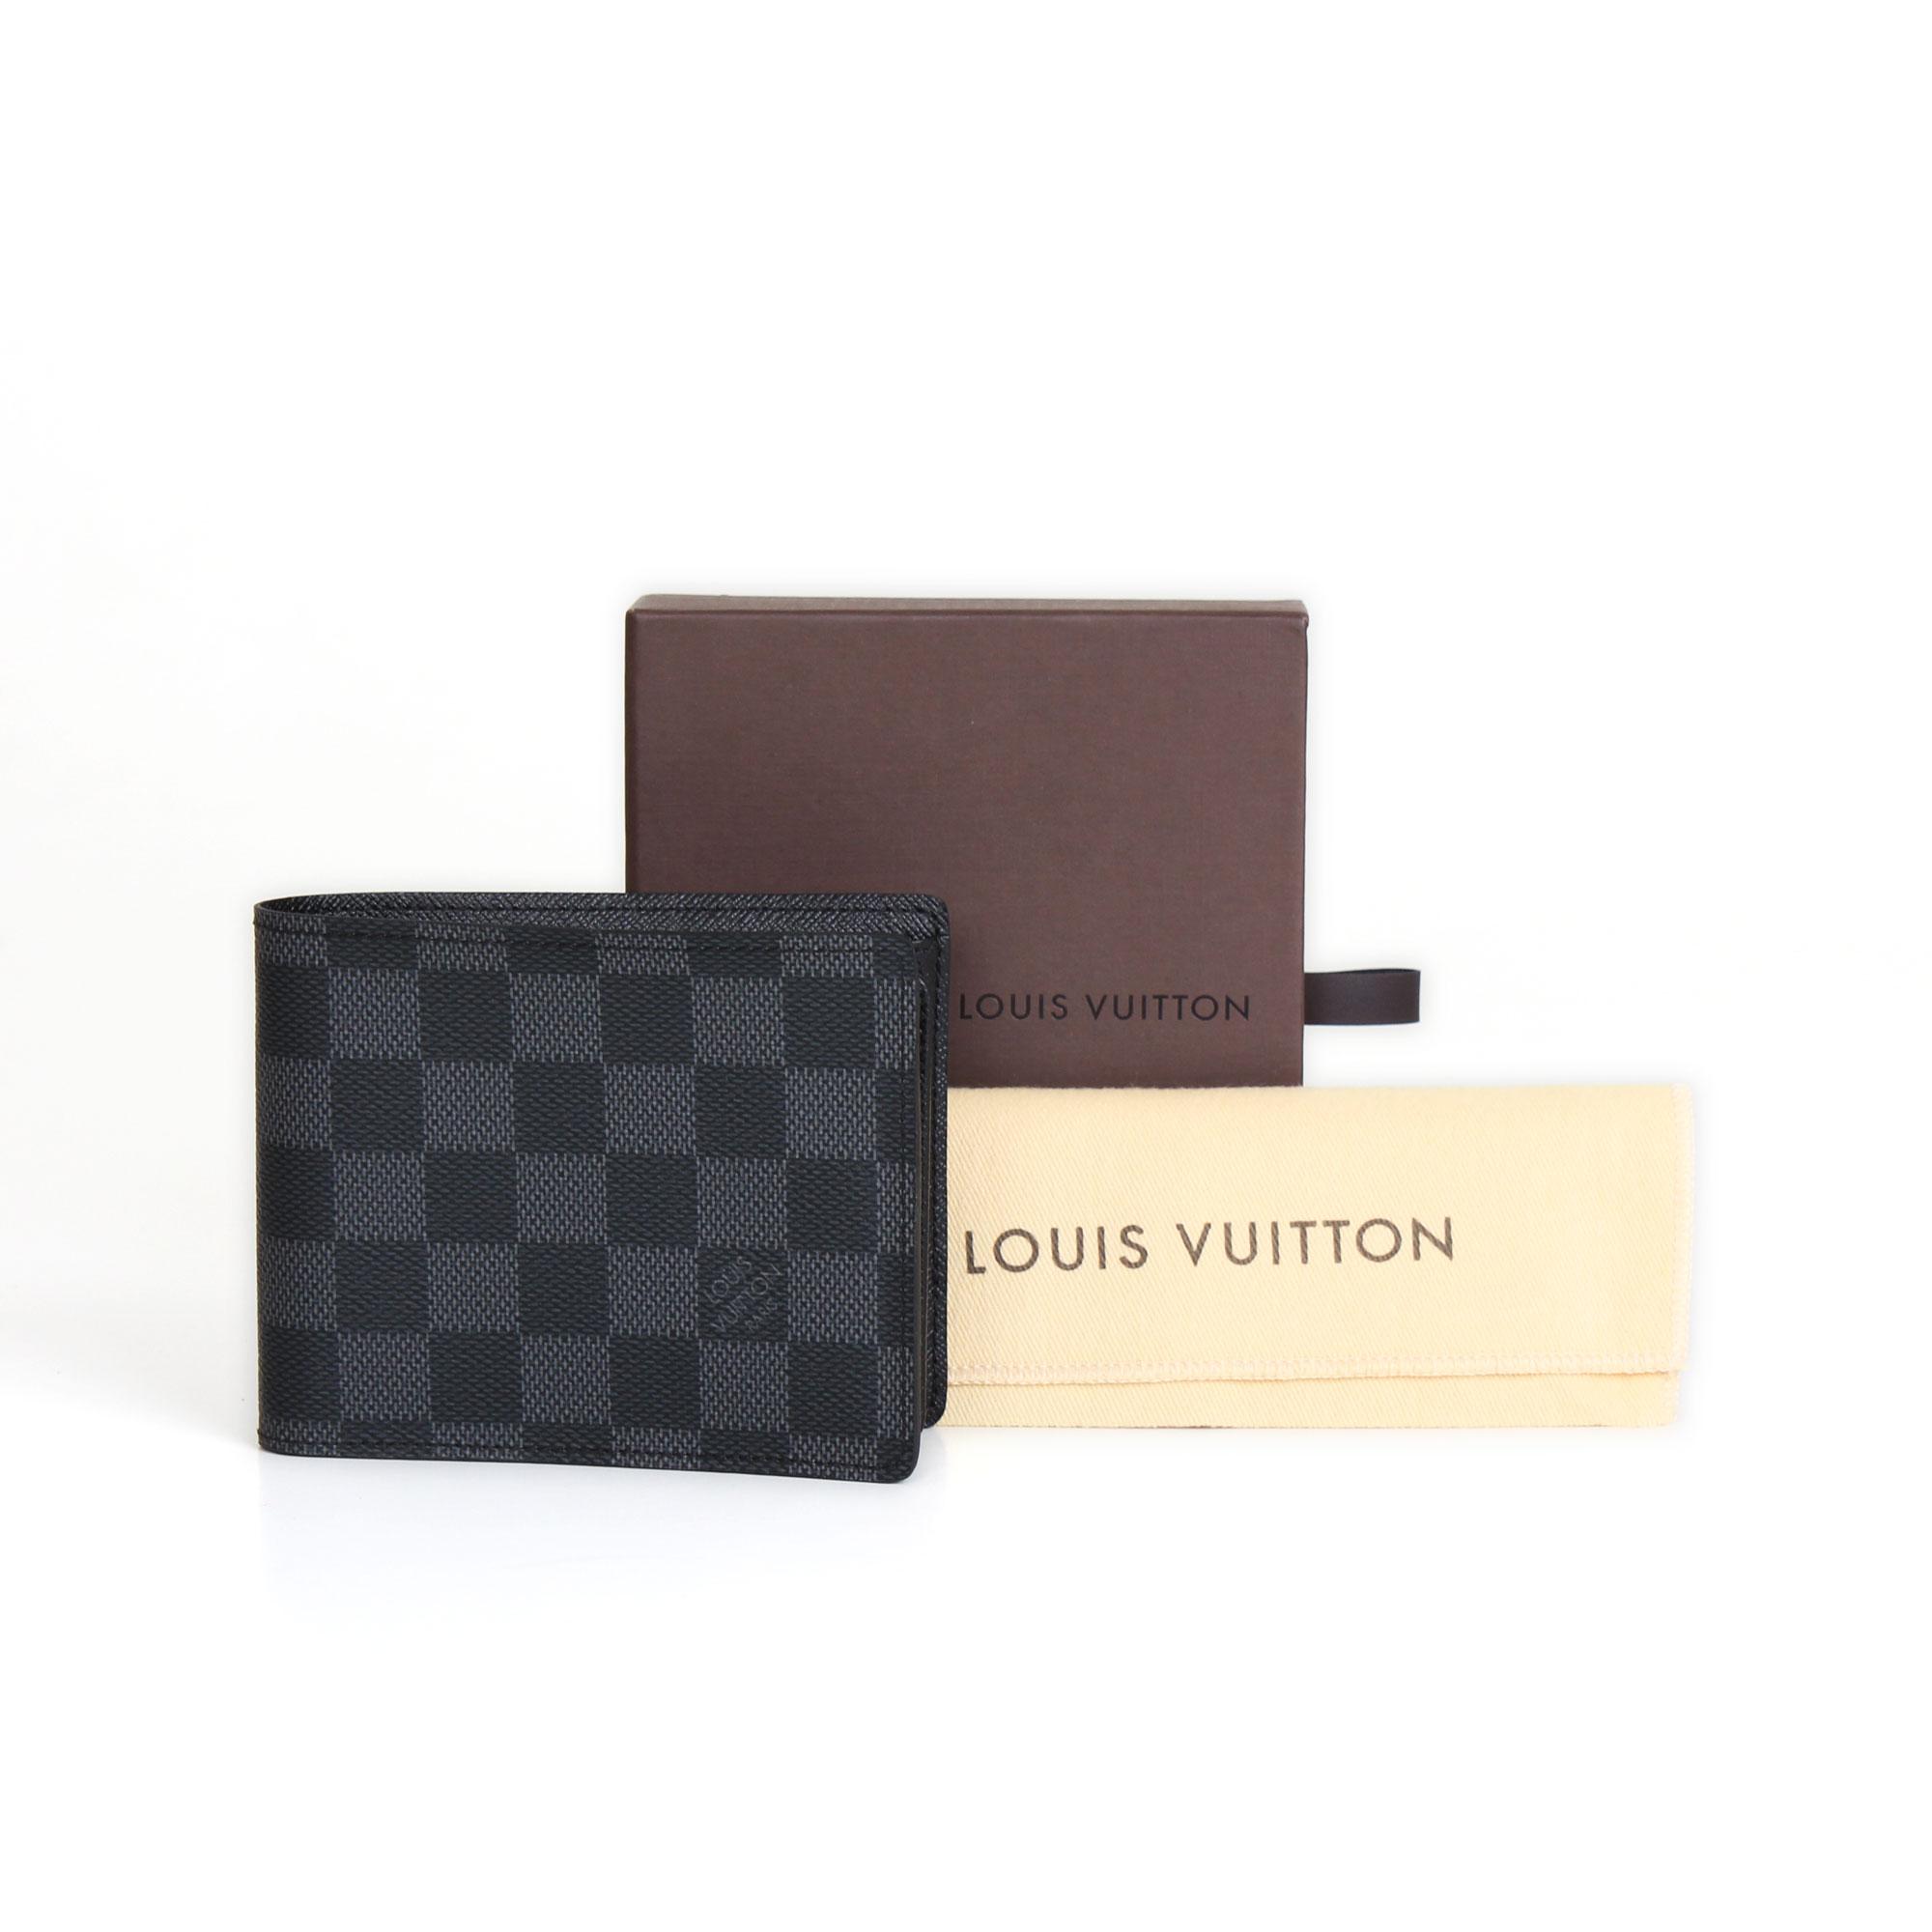 5c1b4257badea Louis Vuitton Florin Damier Graphite Wallet